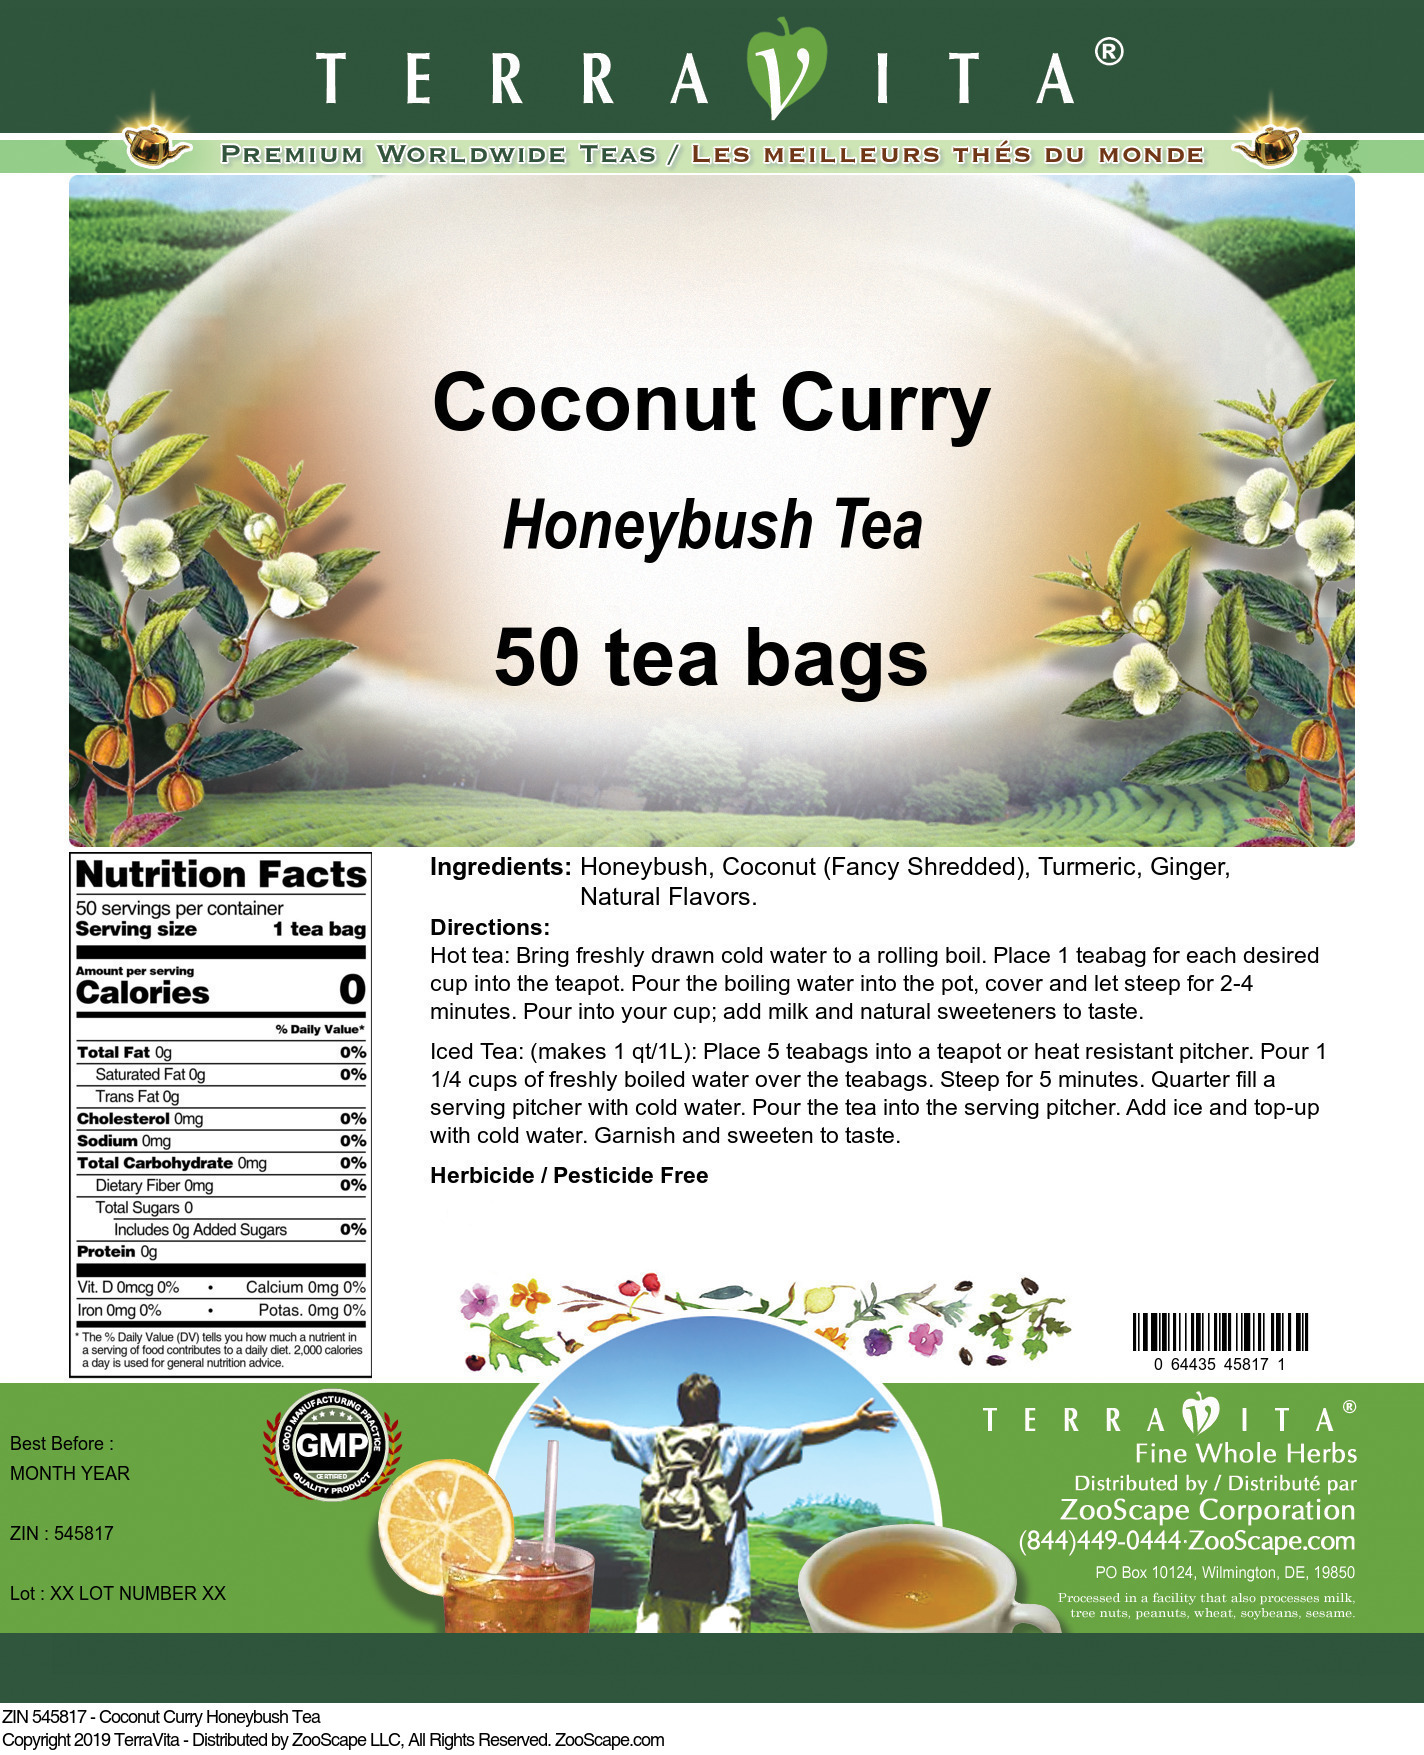 Coconut Curry Honeybush Tea